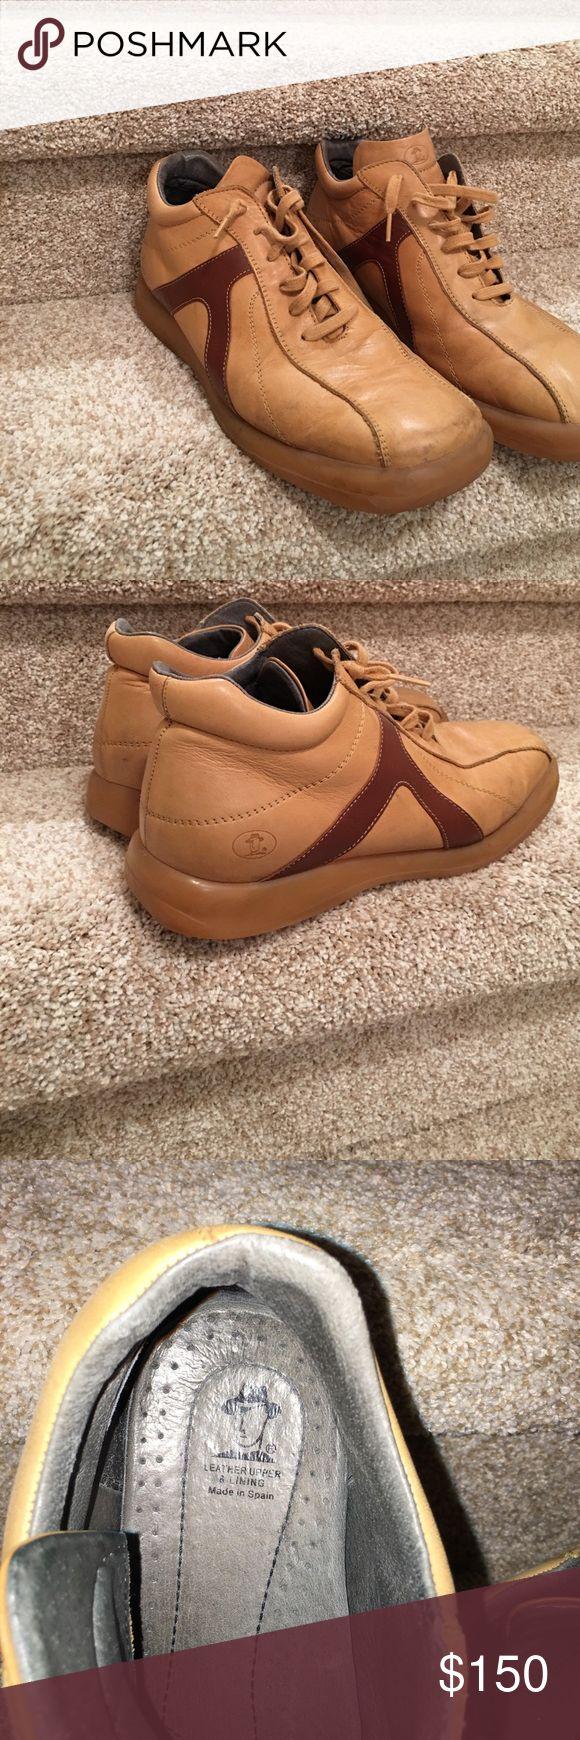 Havana Joe boots size 10.5 Havana Joe chuka boots havana joe Shoes Chukka Boots